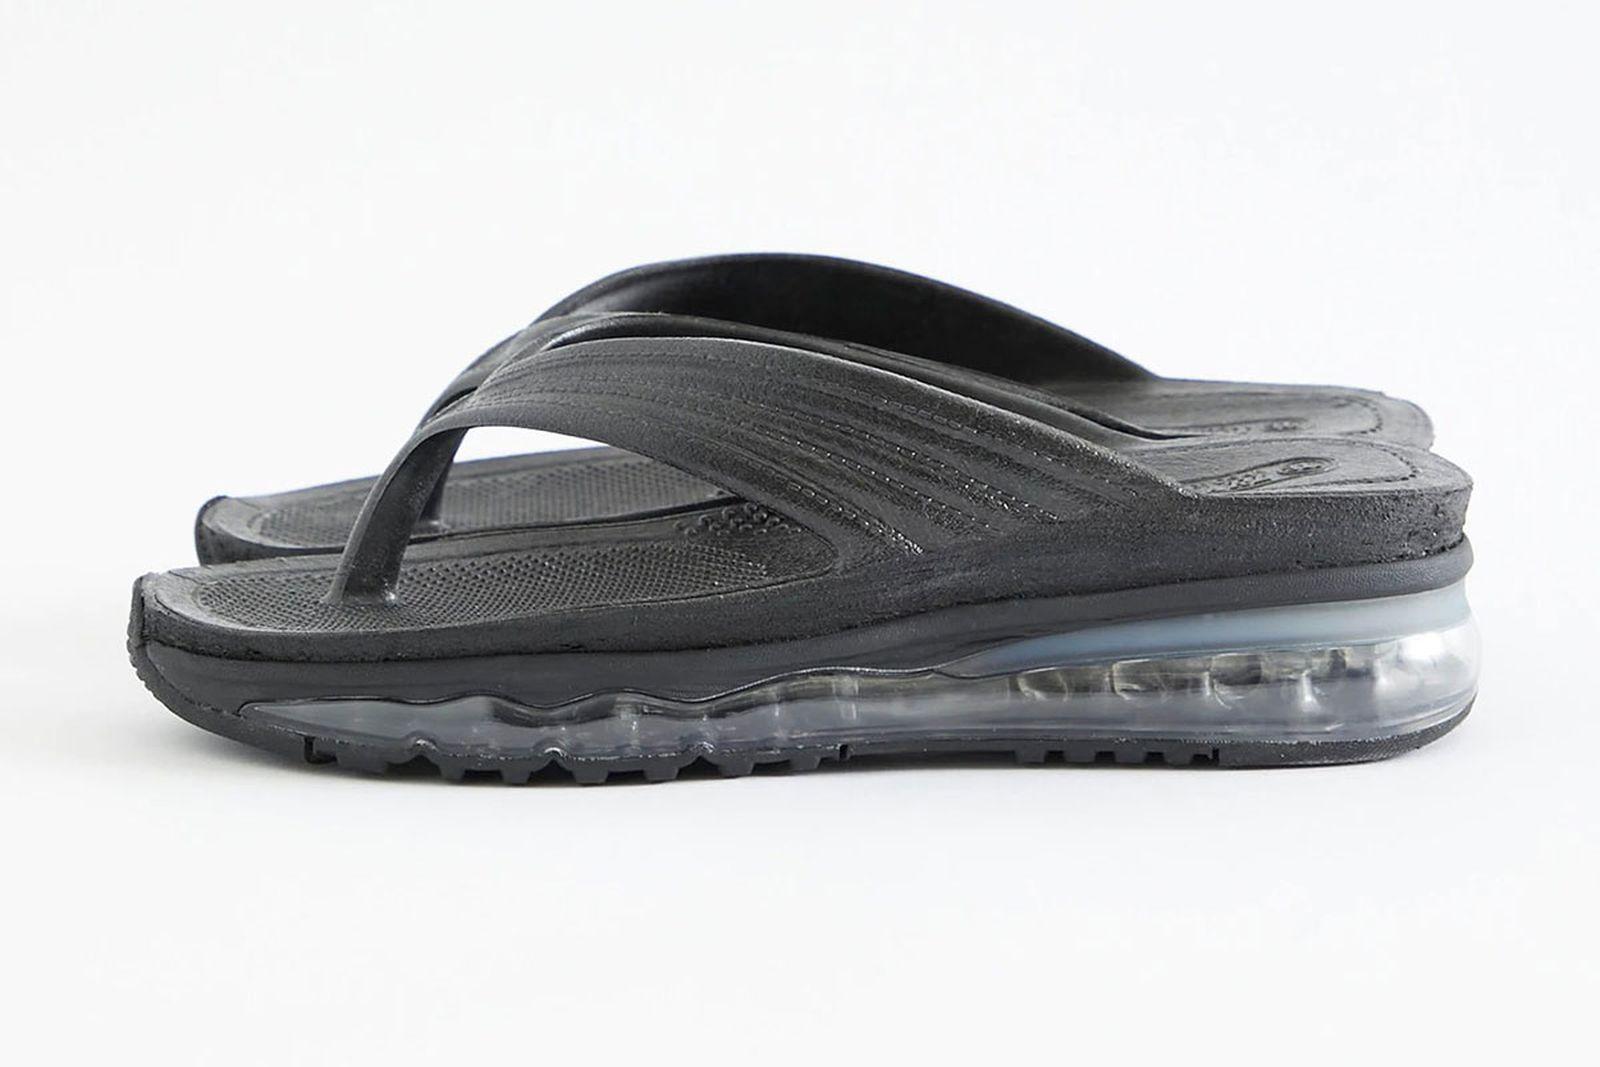 public-tokyo-gyosan-air-sole-sandal-flip-flop- (7)